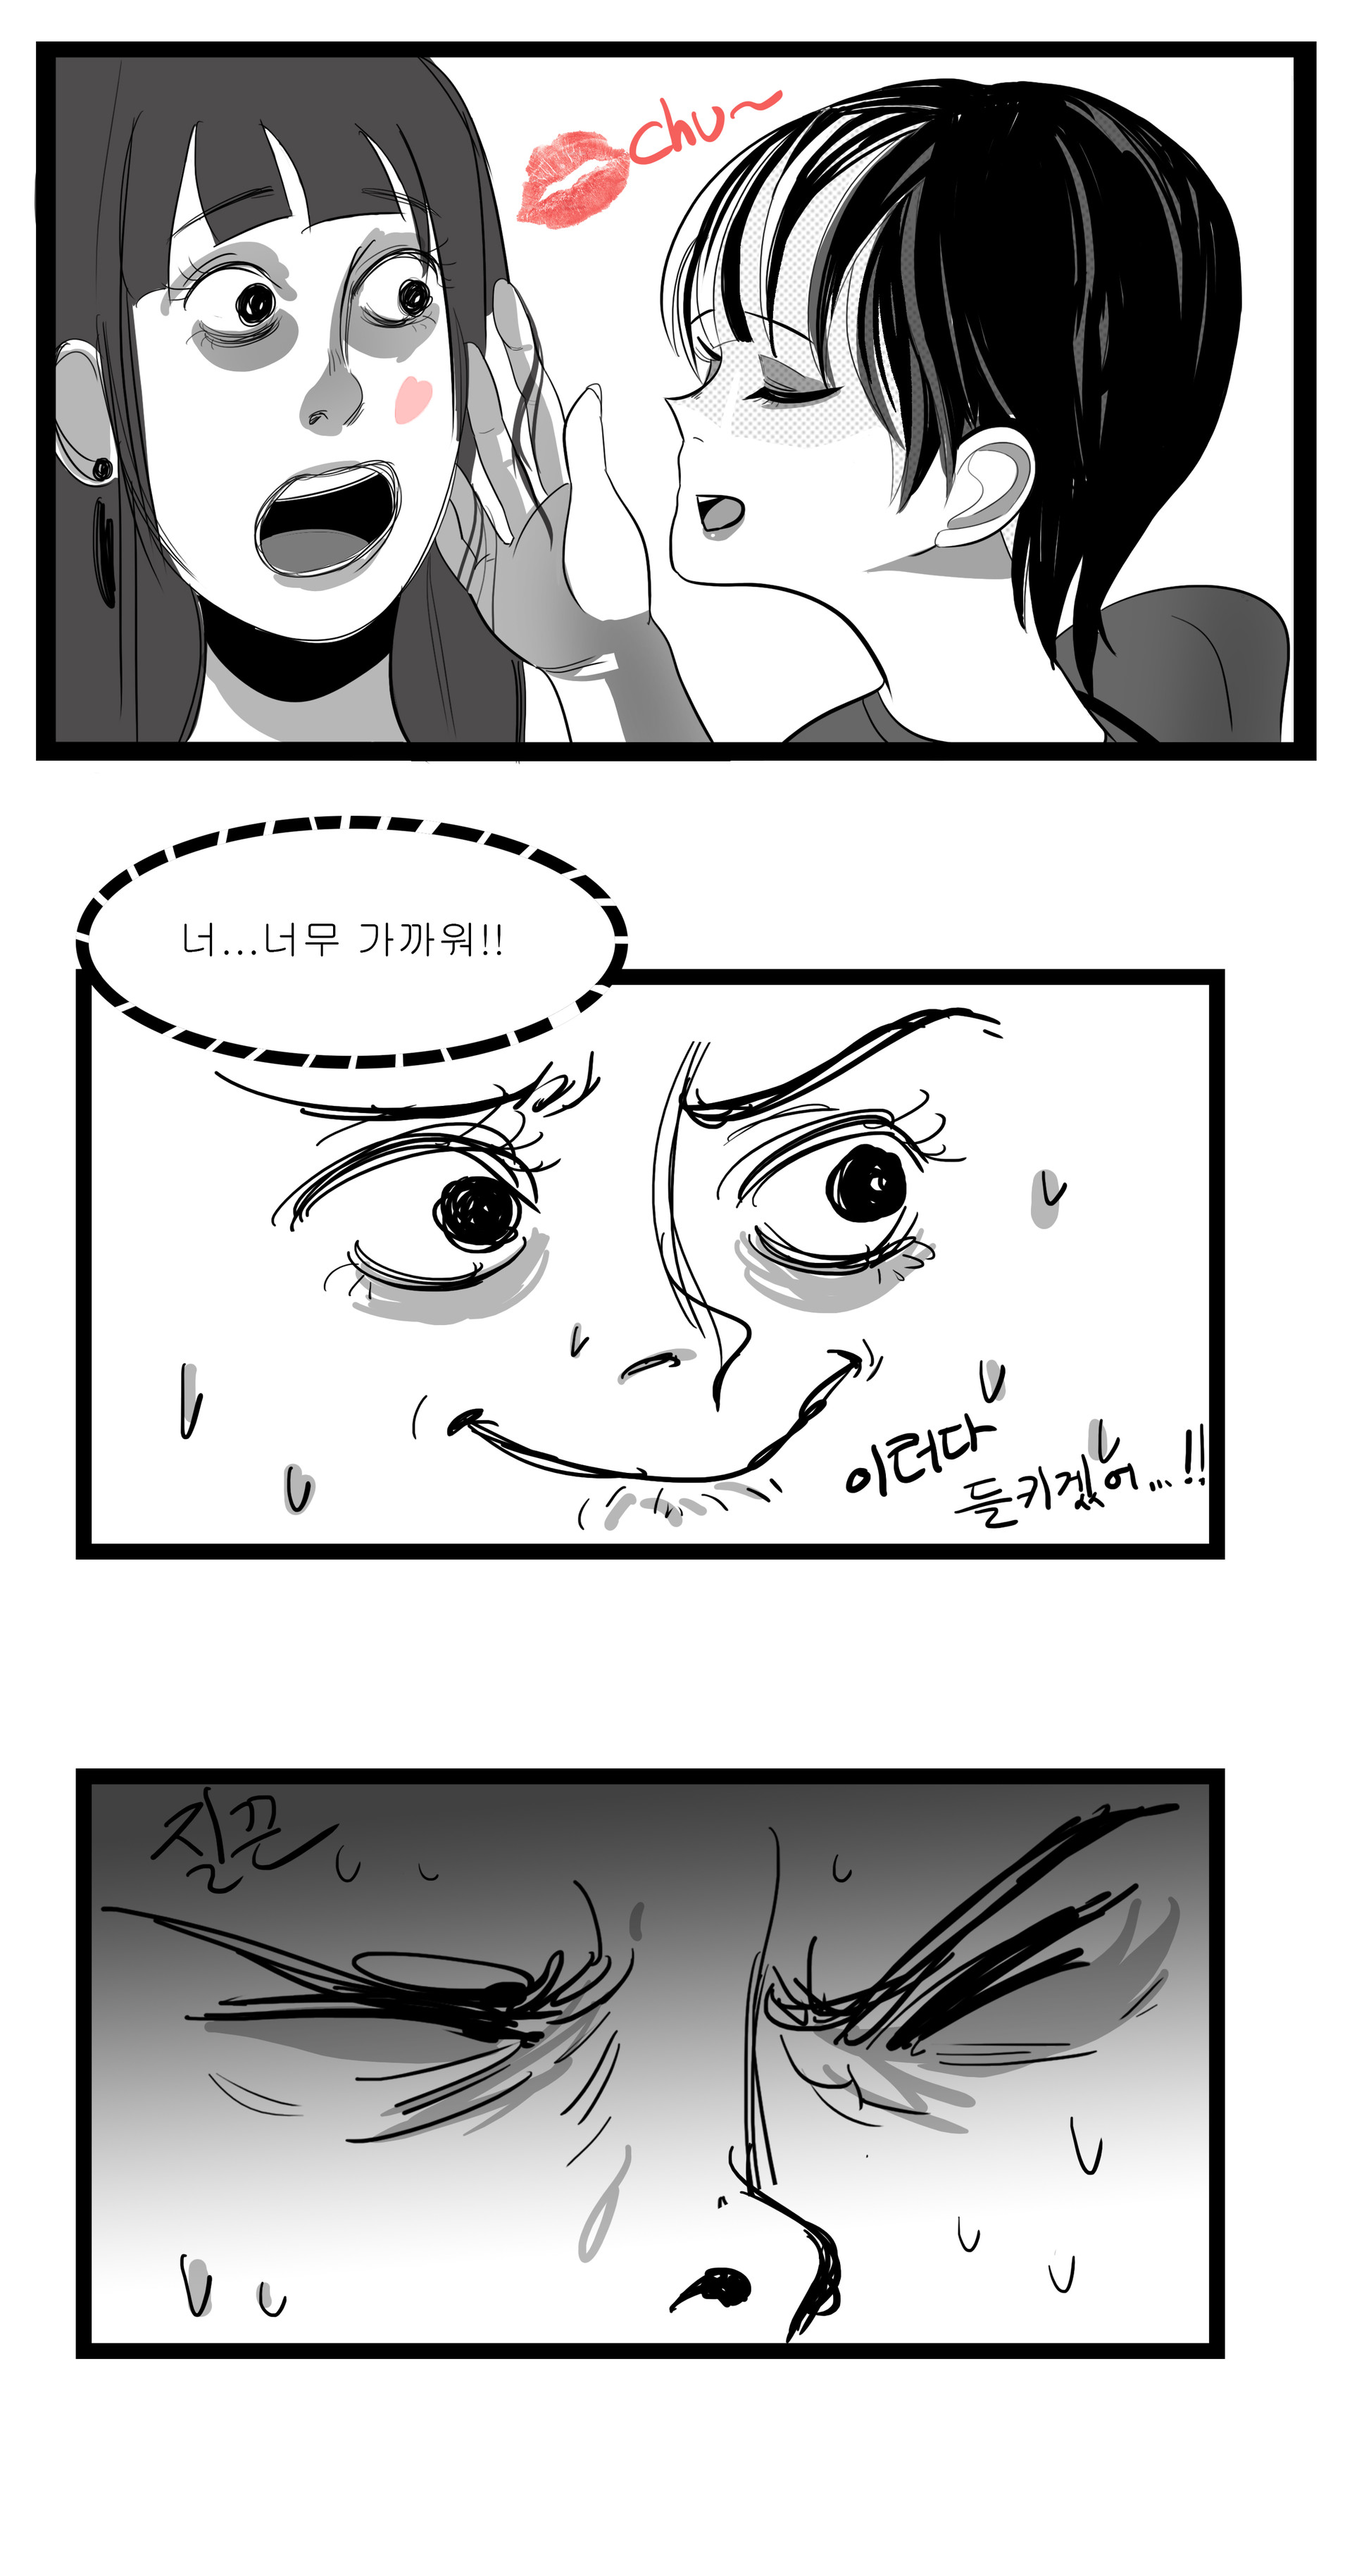 Seungyeop lee 55